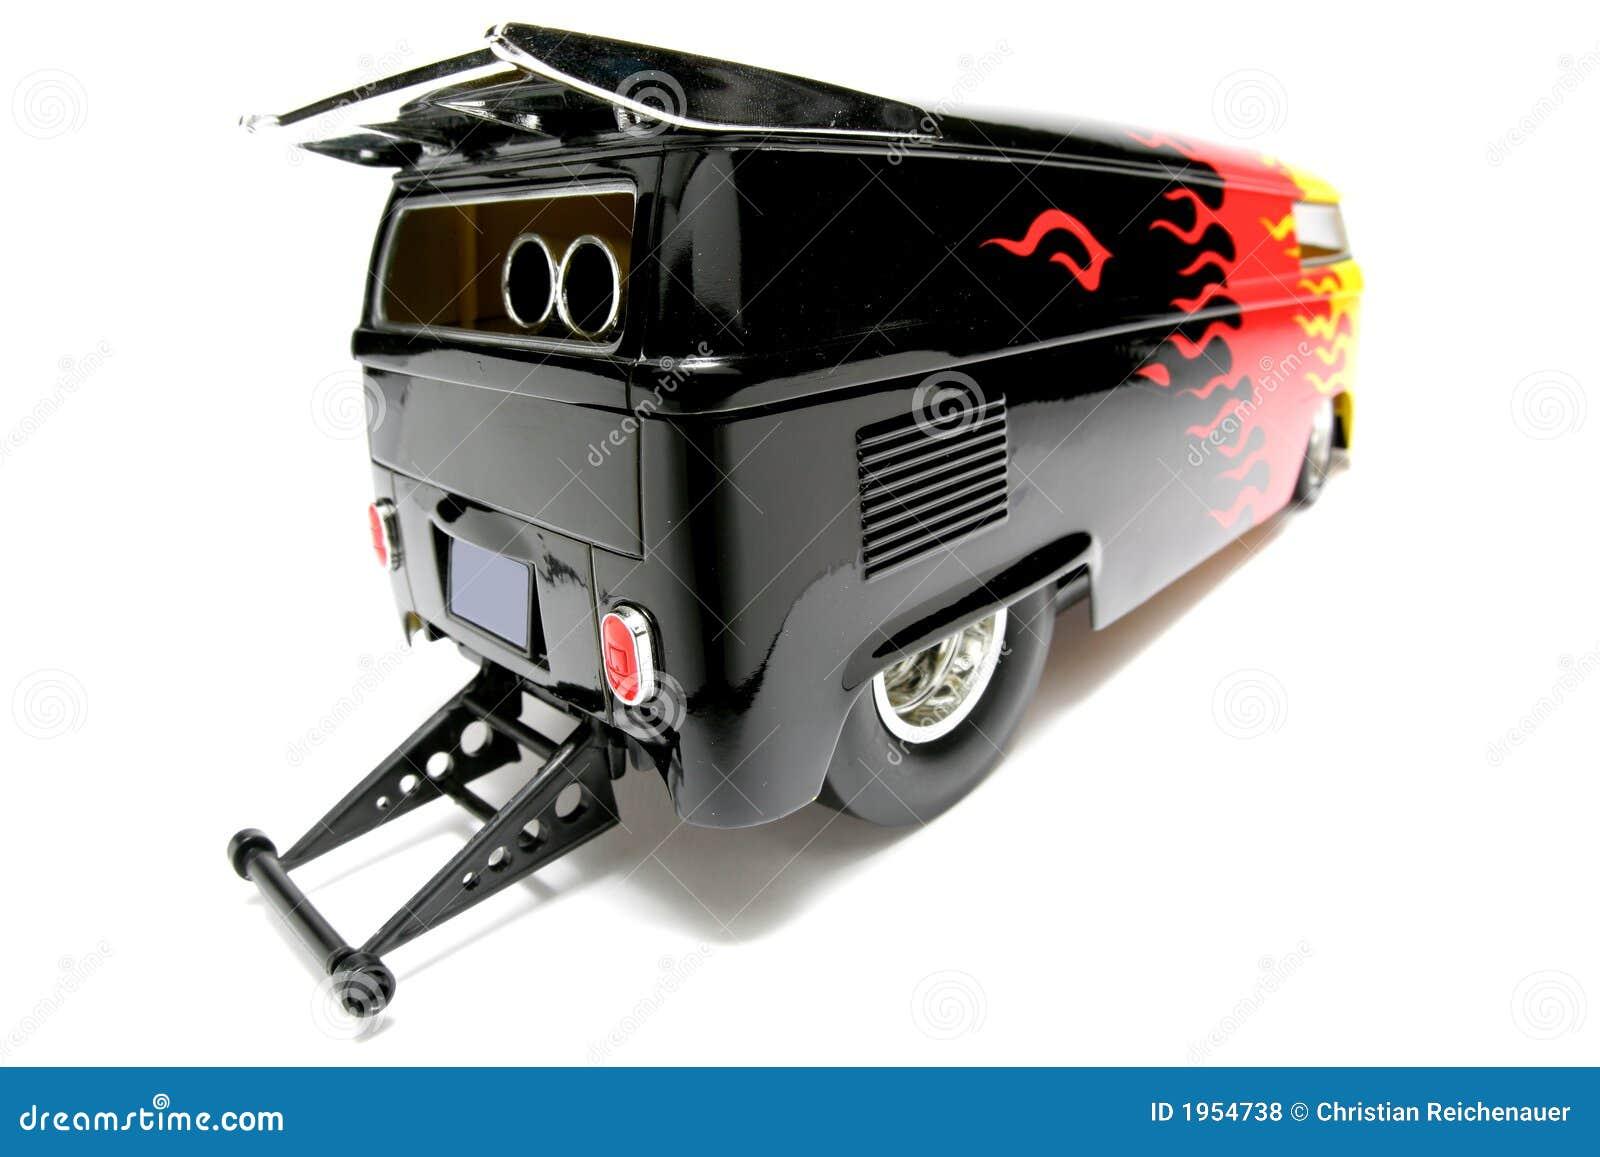 Customized VW Drag Bus scale car fisheye #3